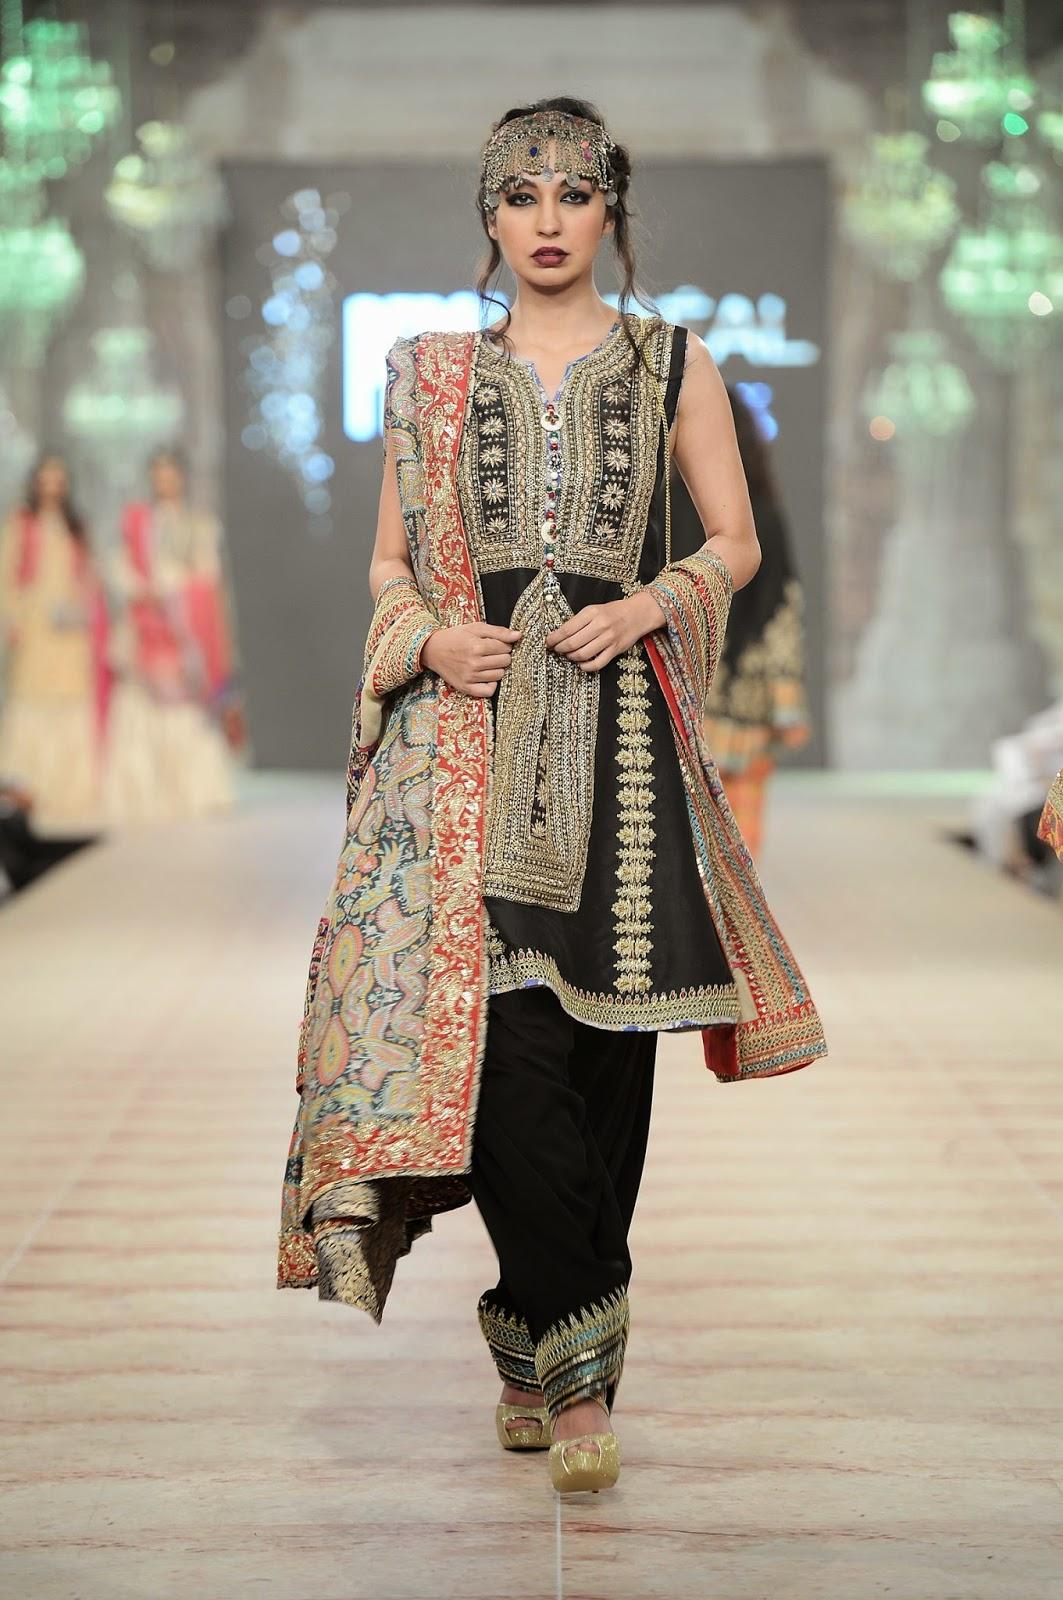 Rubya Chaudhry black shalwar